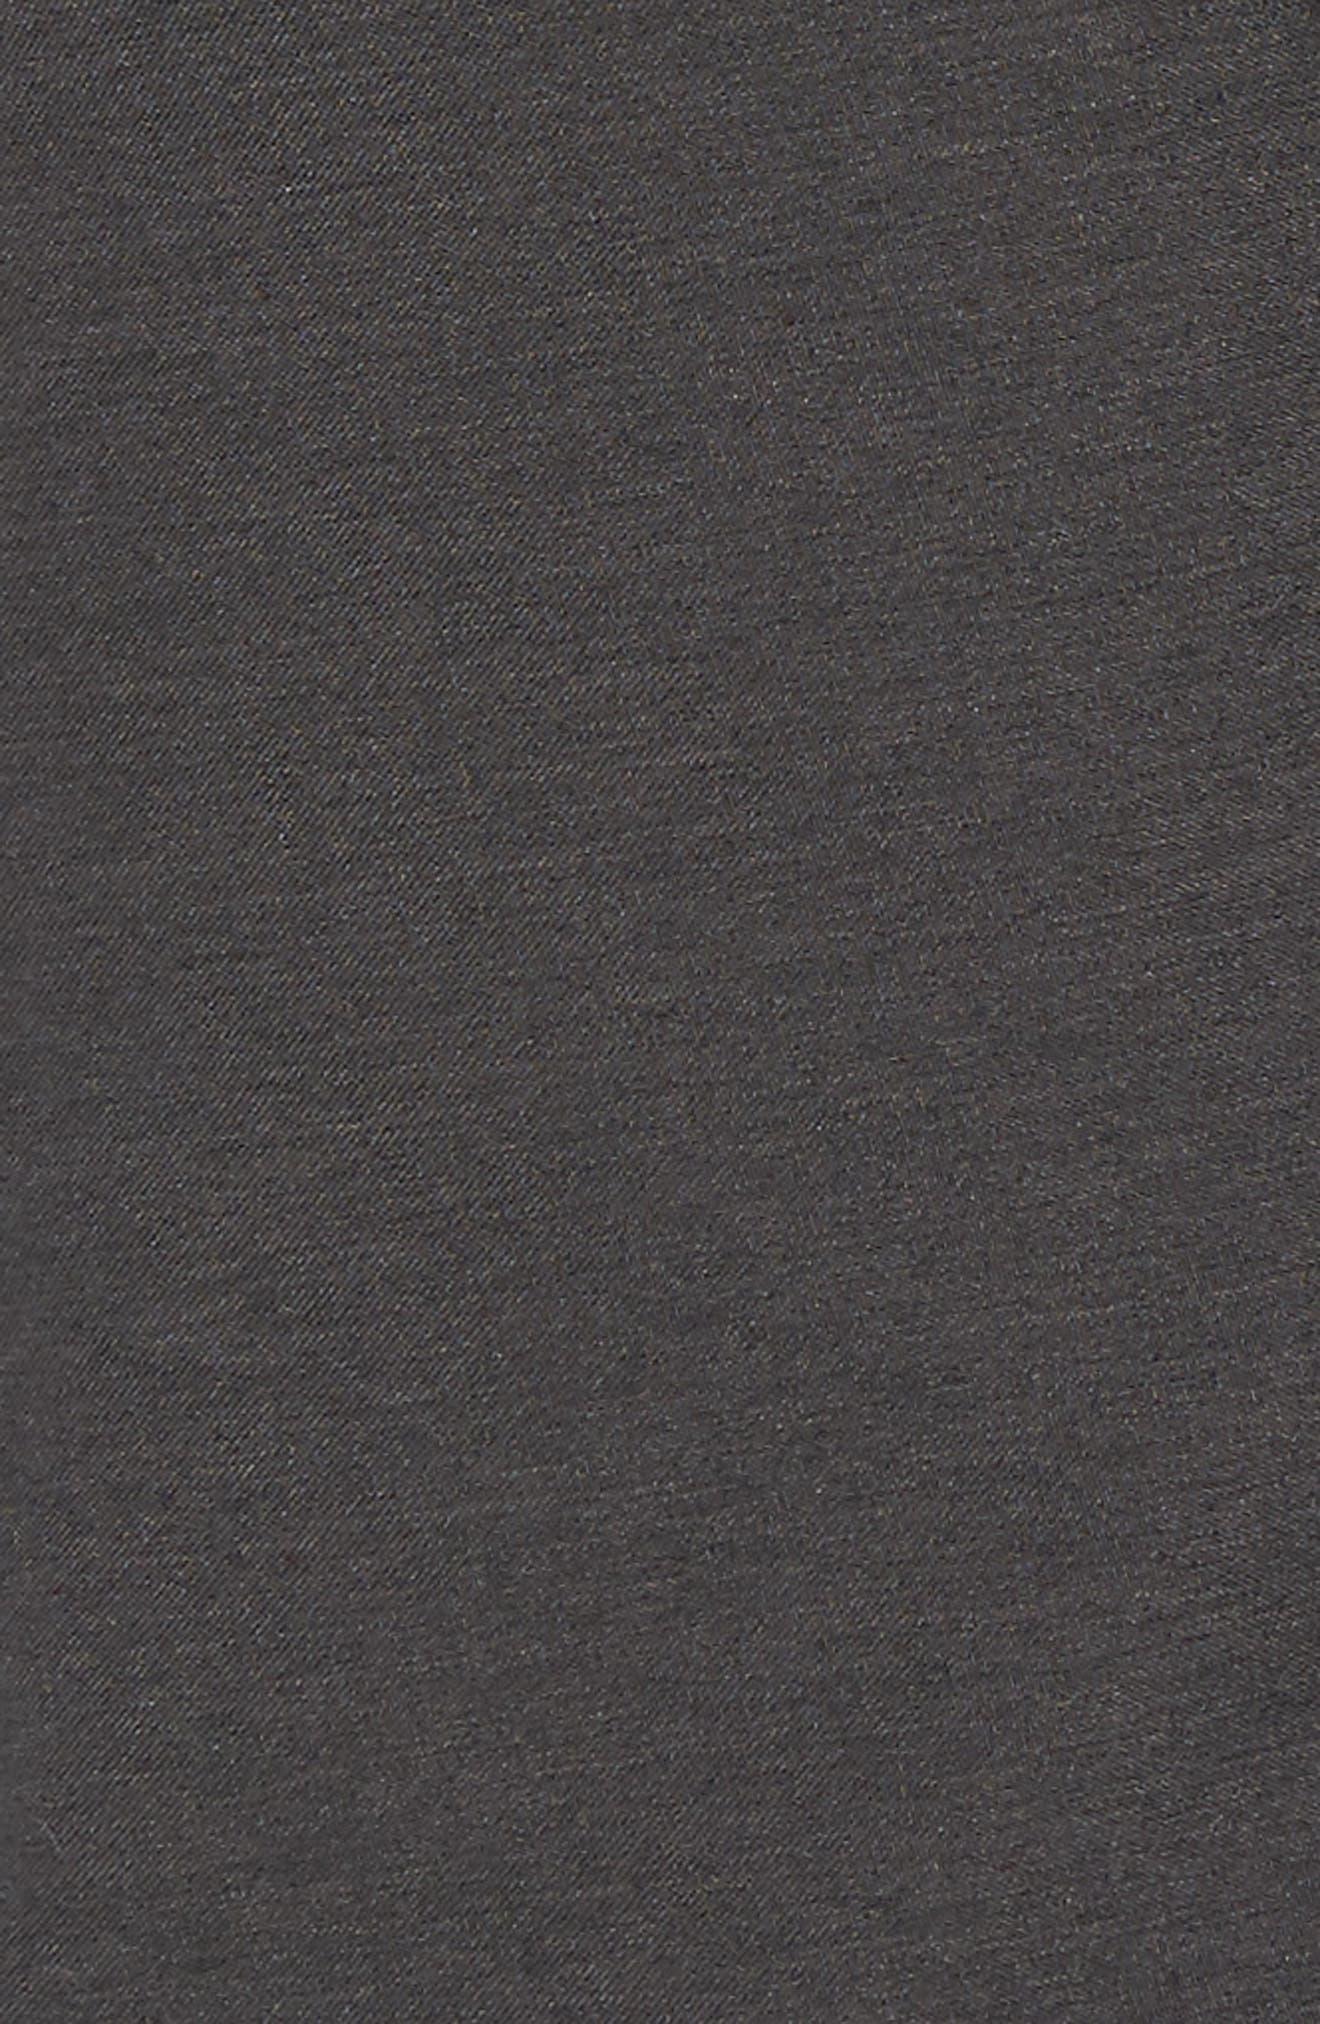 Scheme Cargo Shorts,                             Alternate thumbnail 13, color,